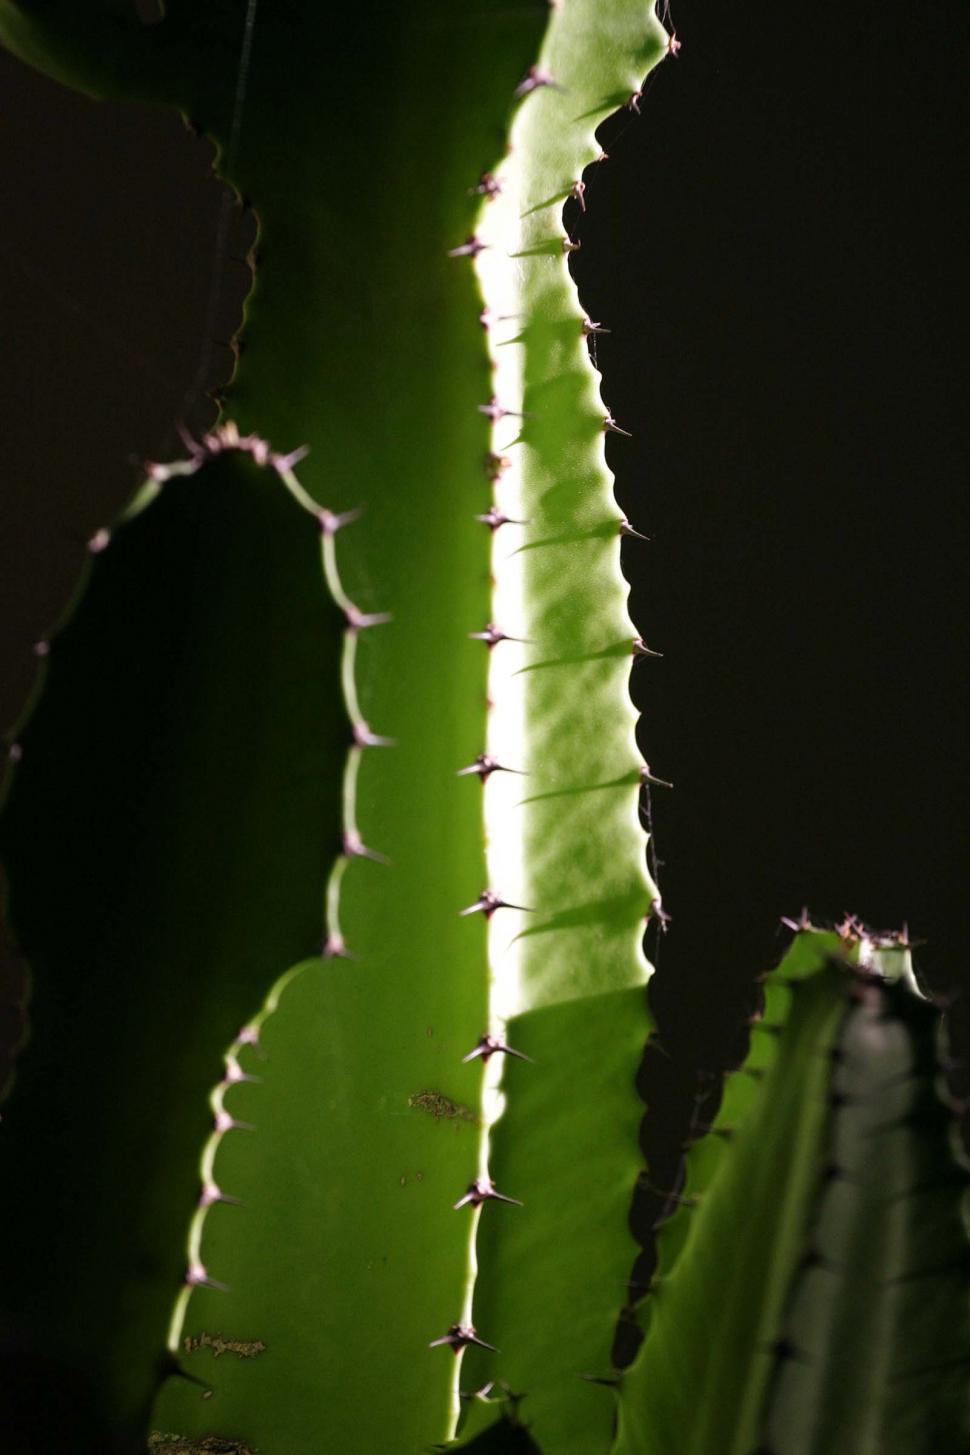 Download Free Stock HD Photo of Dark cactus detail Online